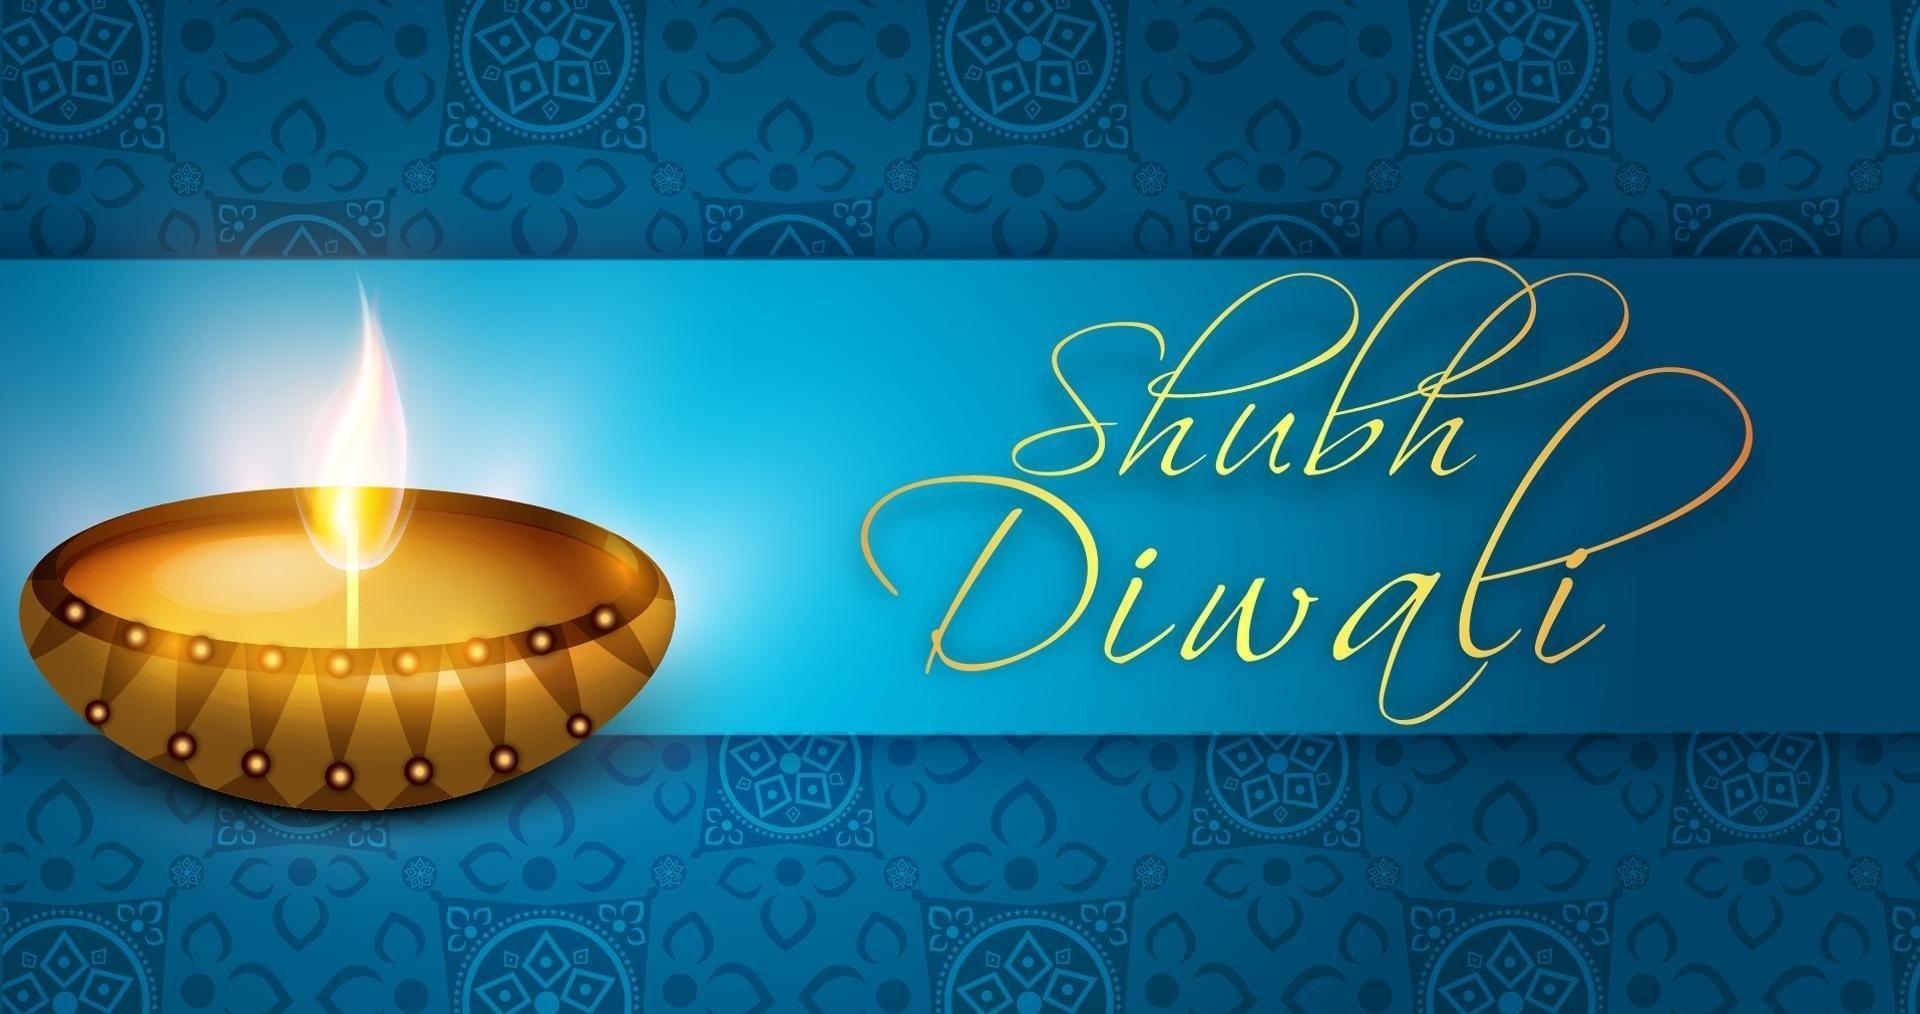 Happy Diwali Images 2017 | Diwali Wallpapers HD | Free Deepawali Images for diwali single diya wallpaper  56mzq